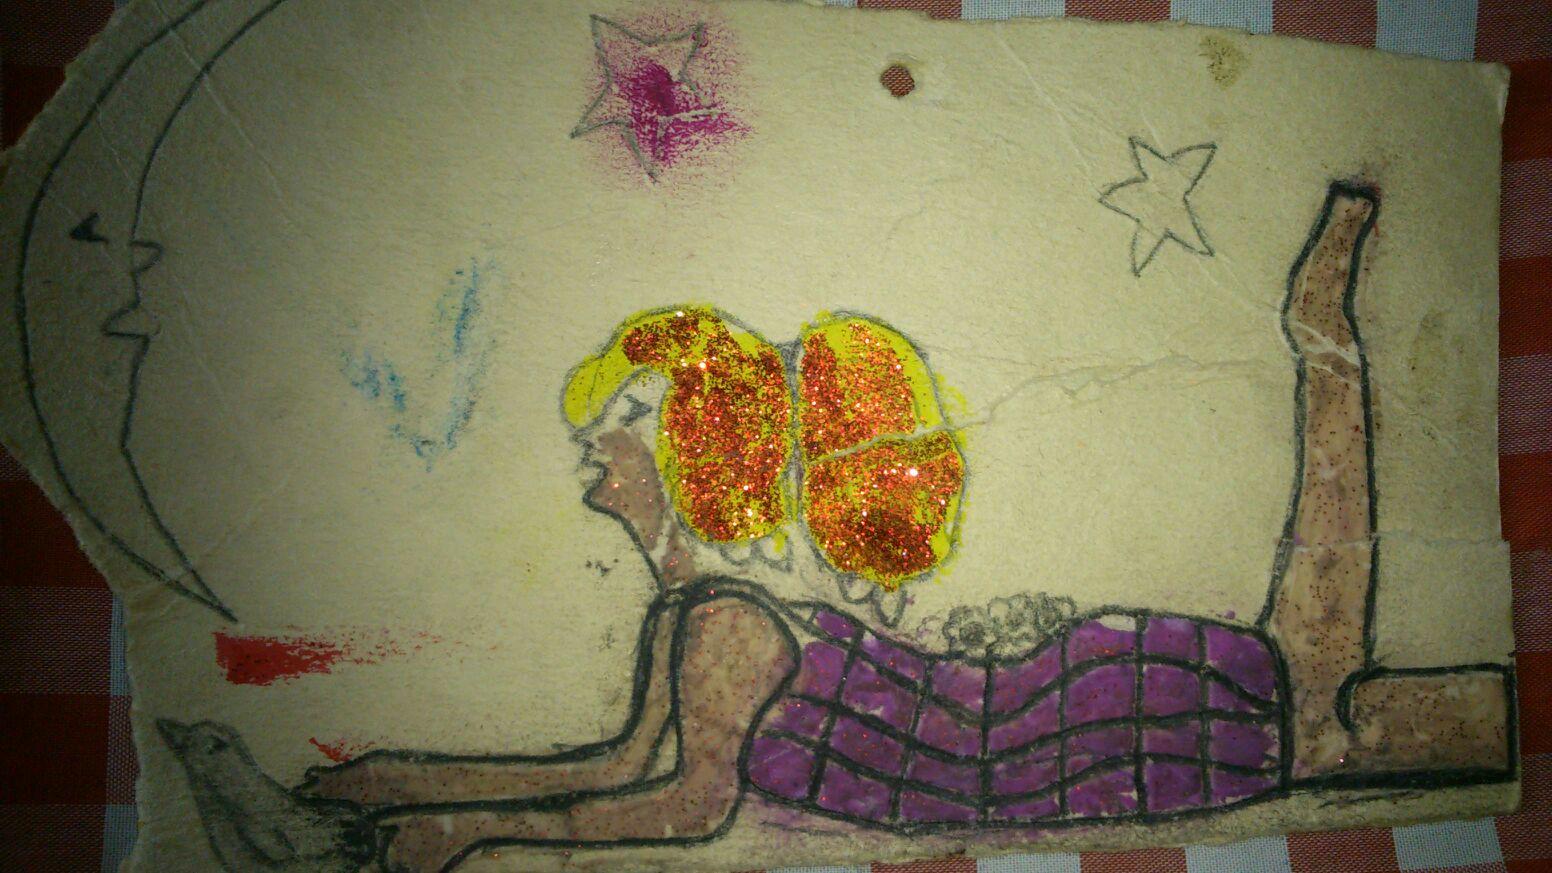 Angie Gómez, Schülerin am Colegio de las Aguas Montebello<br /><em>&#8222;Meine Geschichte&#8220;</em>